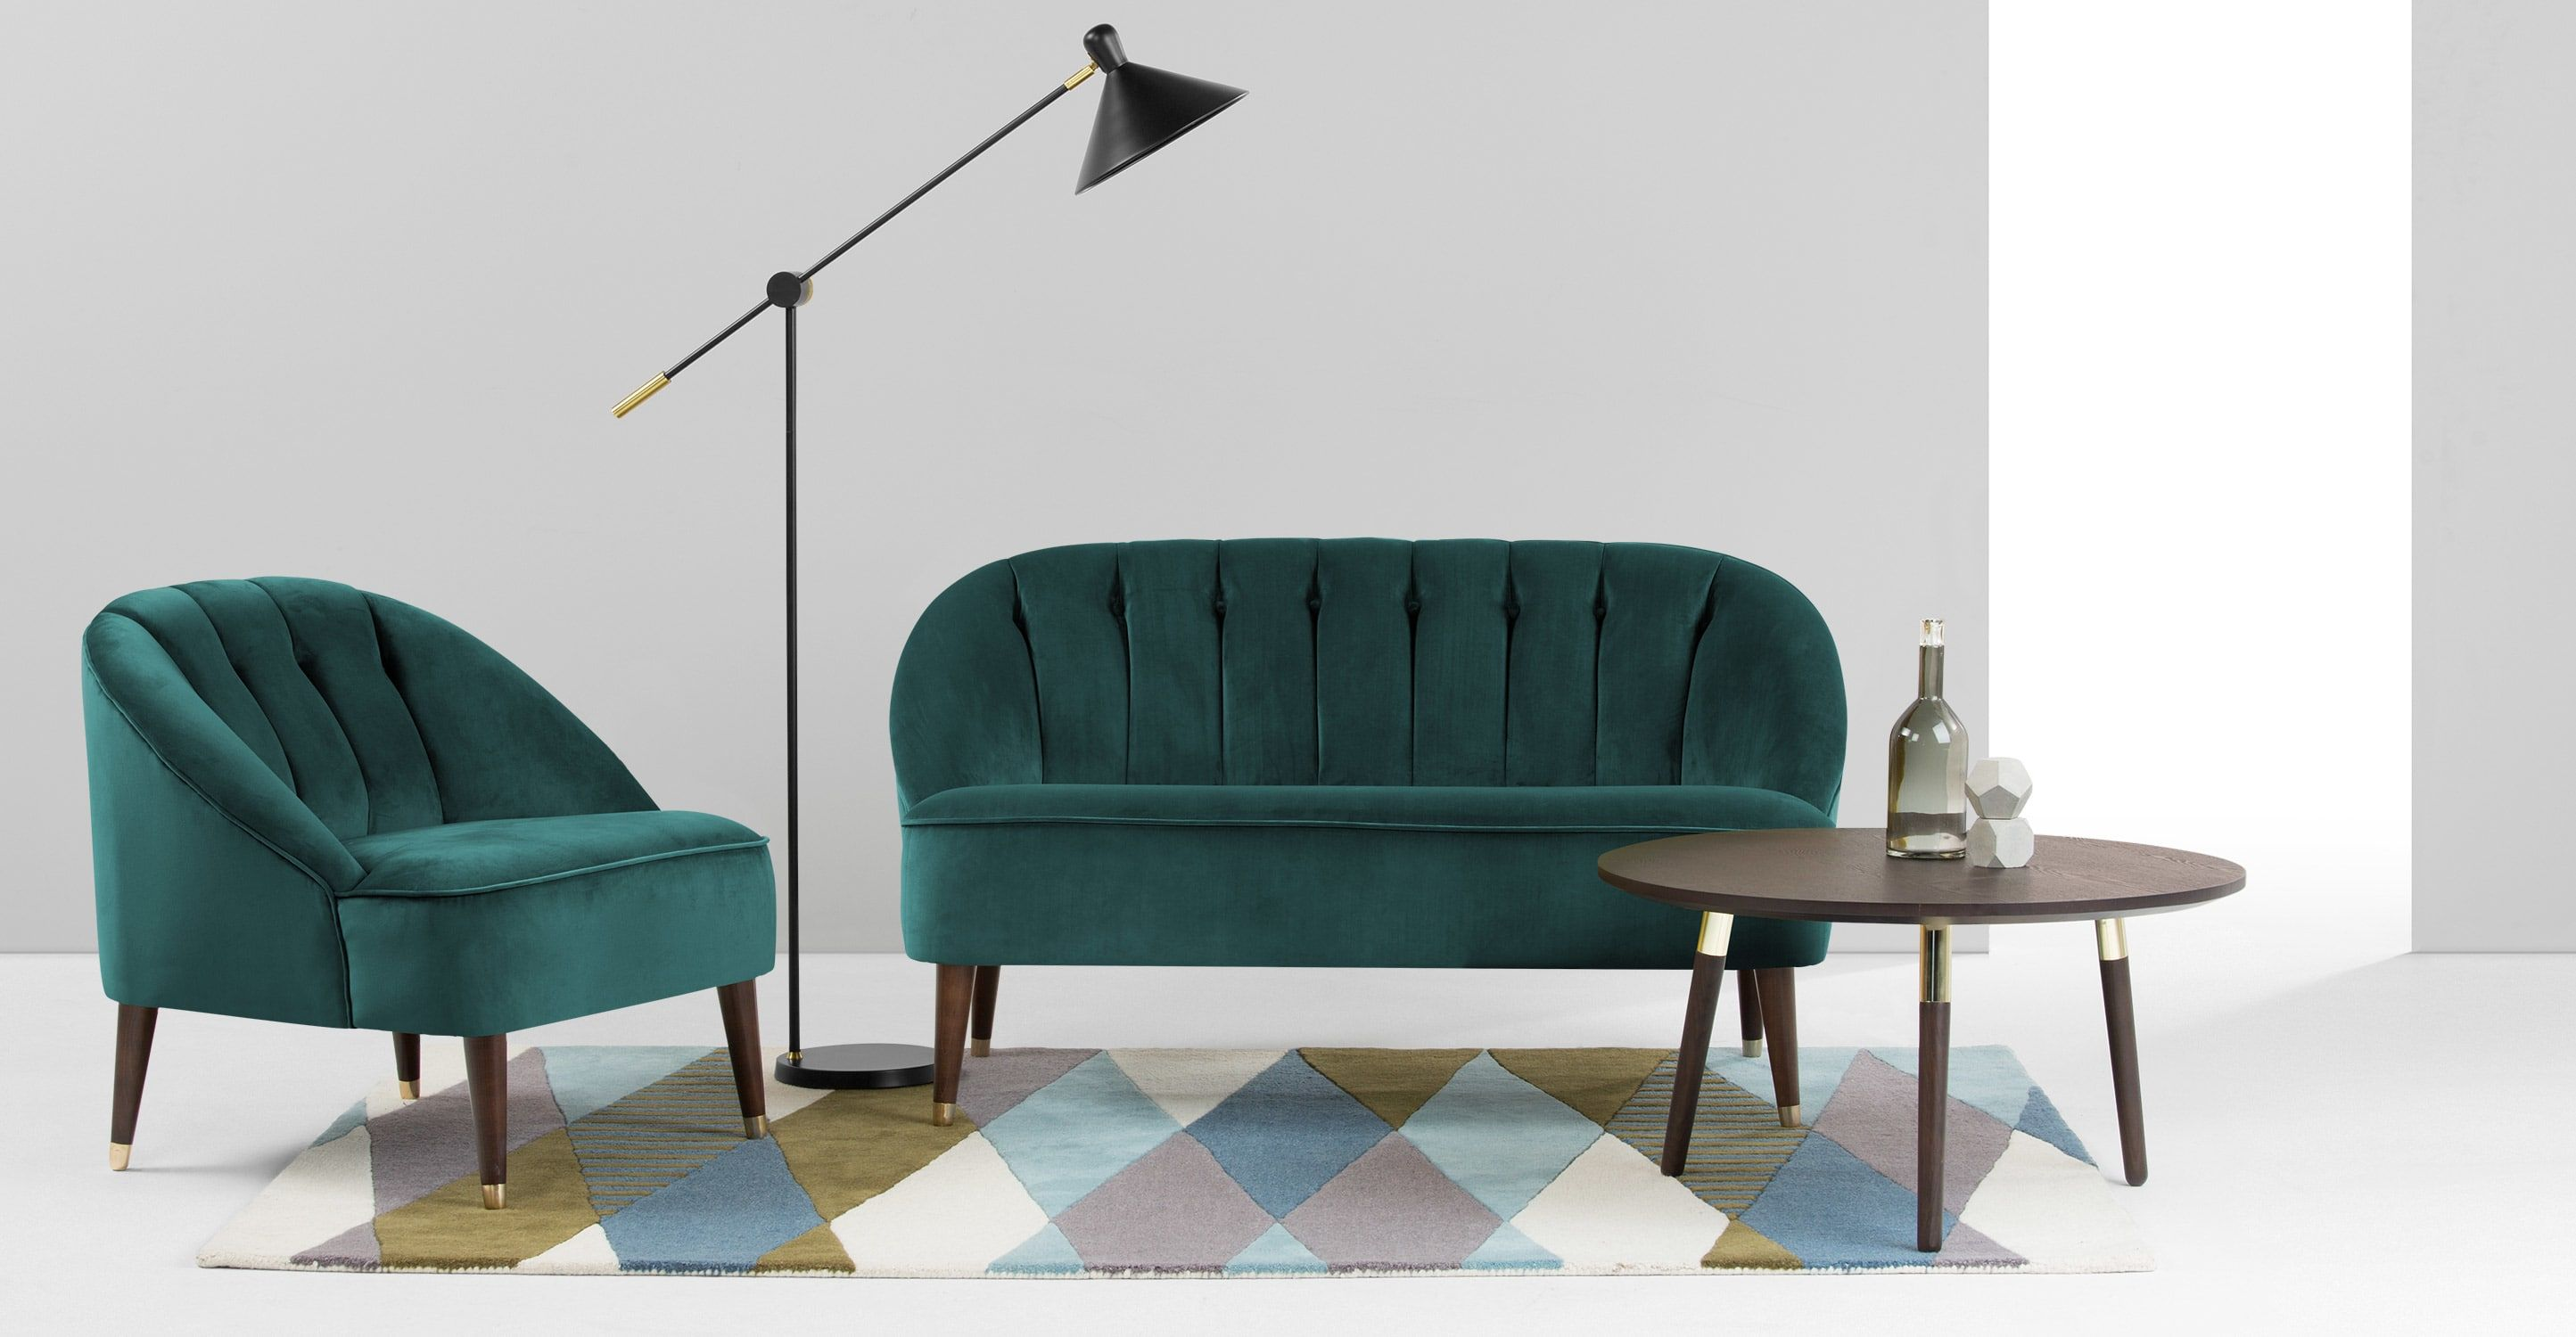 Sessel schlafzimmer ~ Margot sessel ▻ entdecke moderne designmöbel jetzt bei made